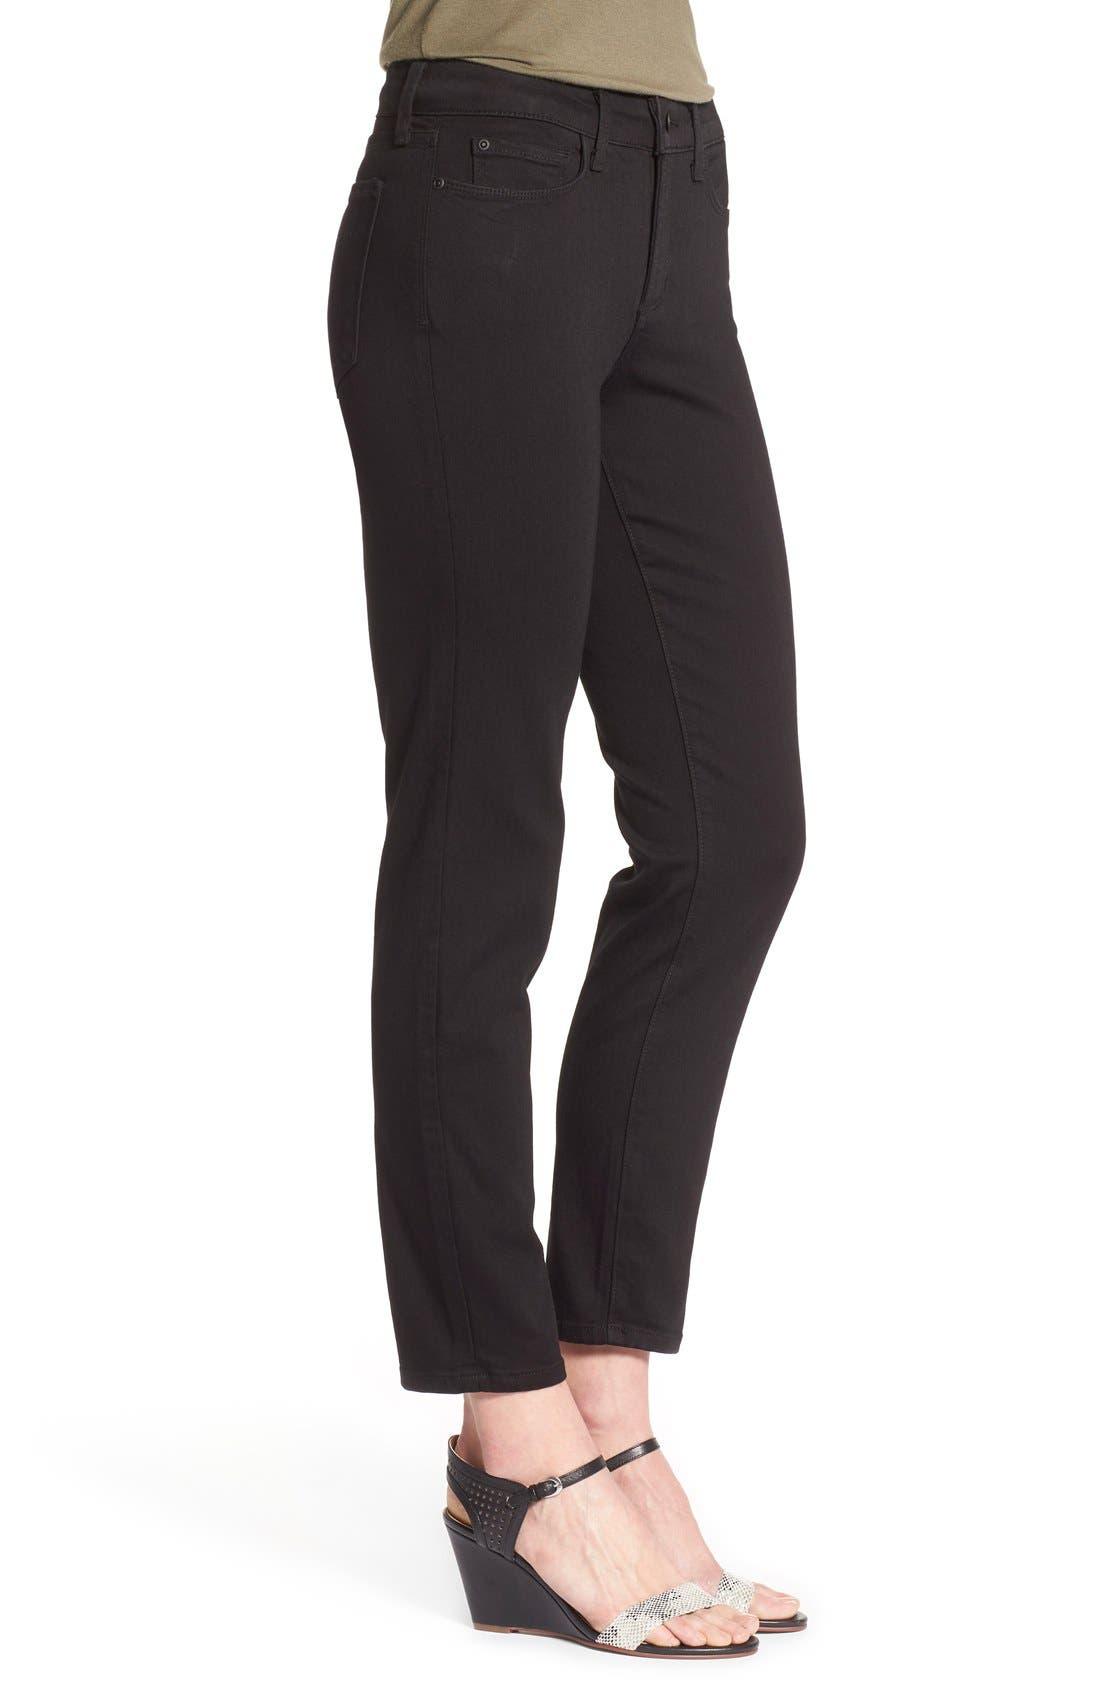 'Clarissa' Stretch Ankle Skinny Jeans,                             Alternate thumbnail 3, color,                             Black Garment Wash